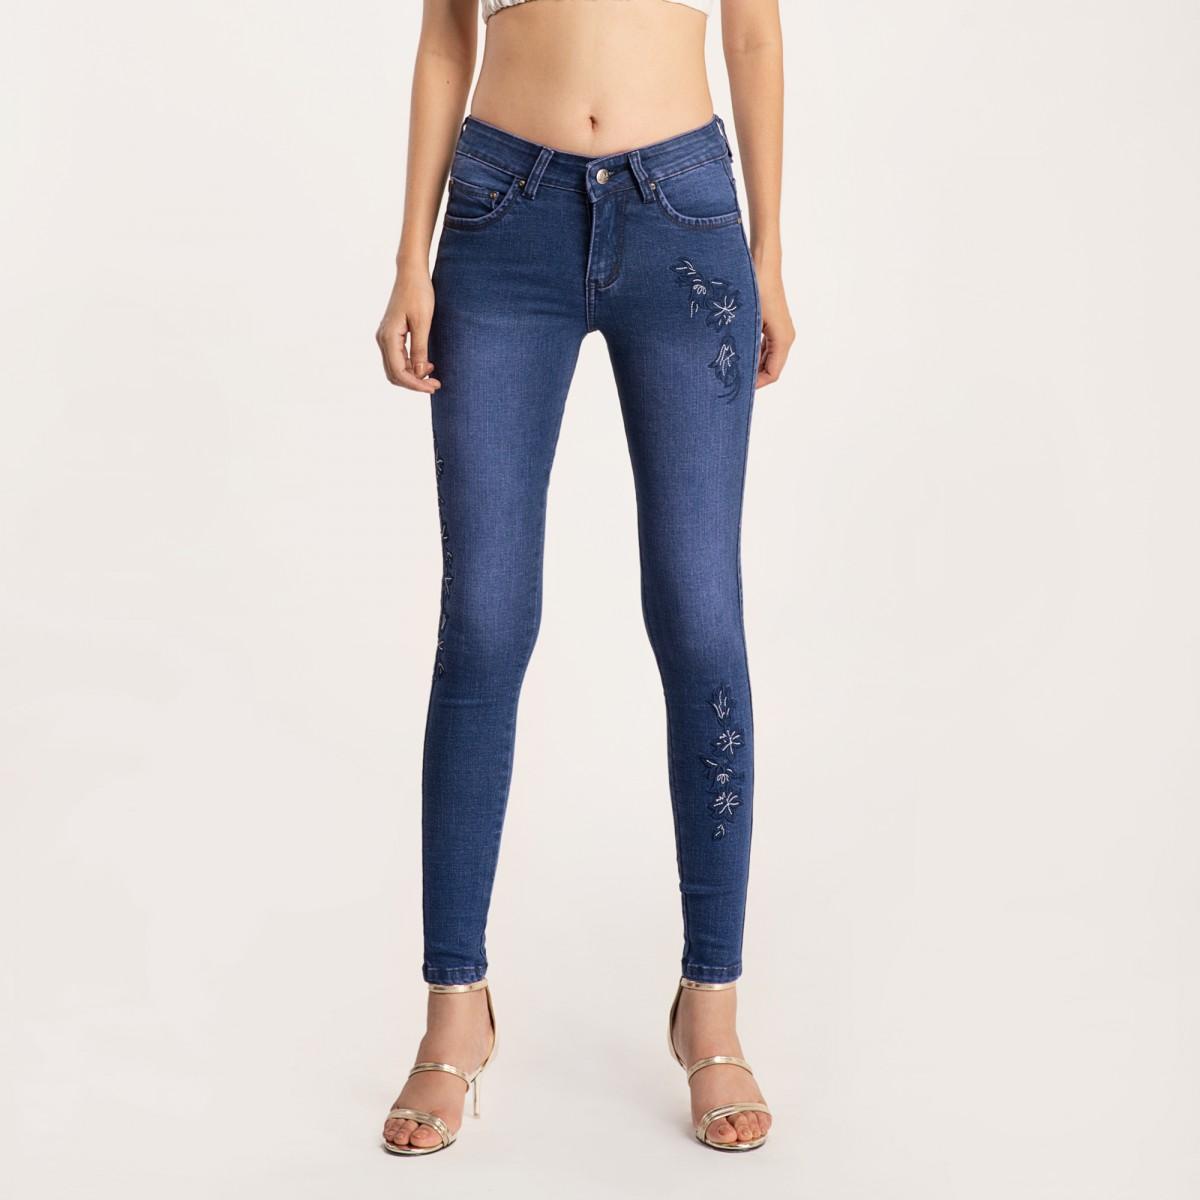 Stretchable Skinny Slim Jeans   Women jeans, Skinny, Jeans